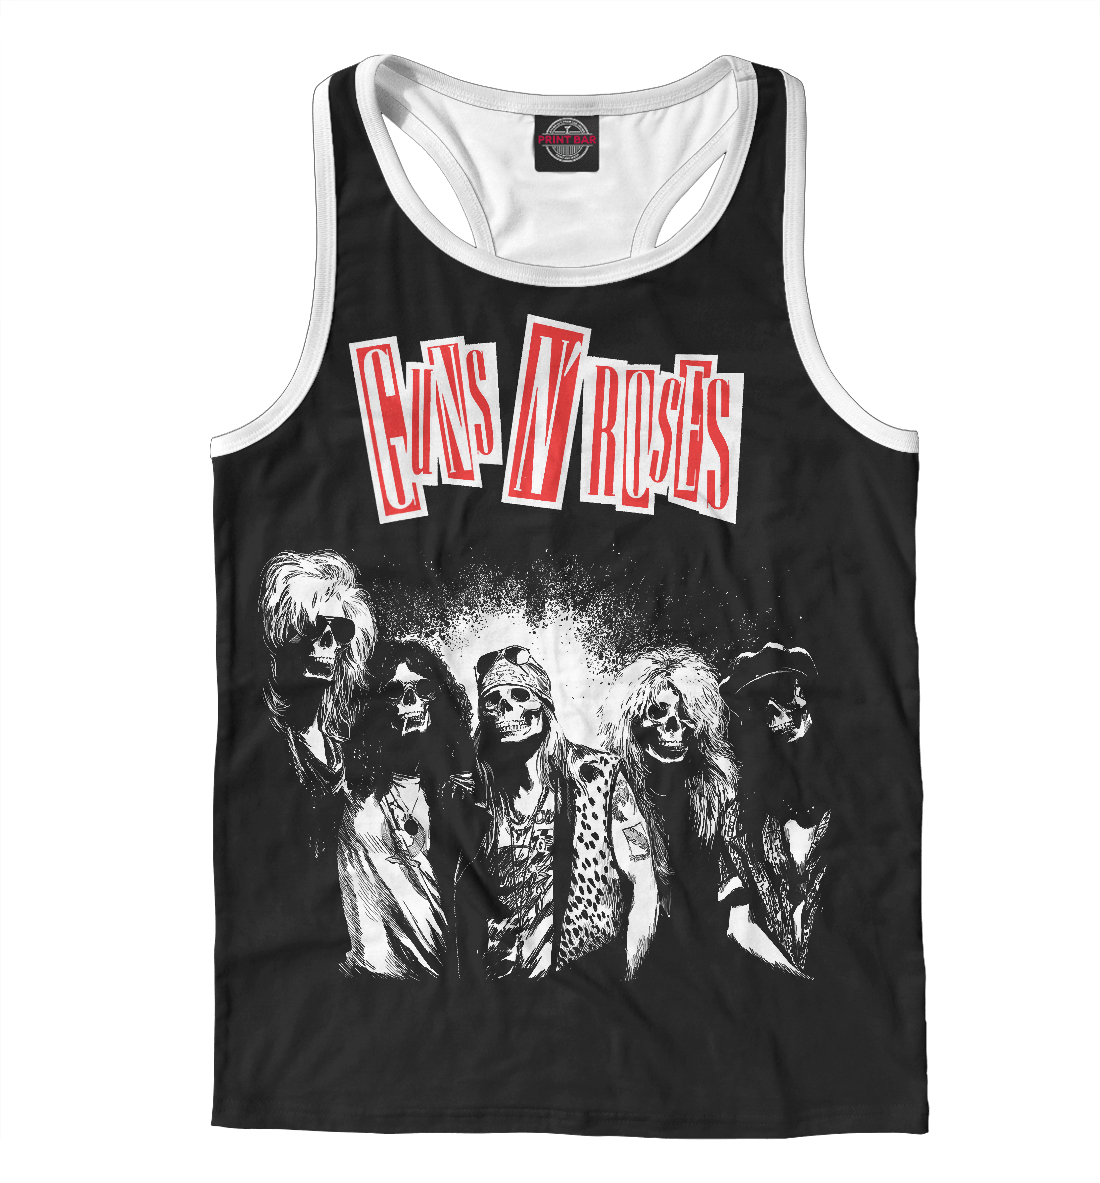 Купить Guns N' Roses, Printbar, Майки борцовки, MZK-562023-mayb-2